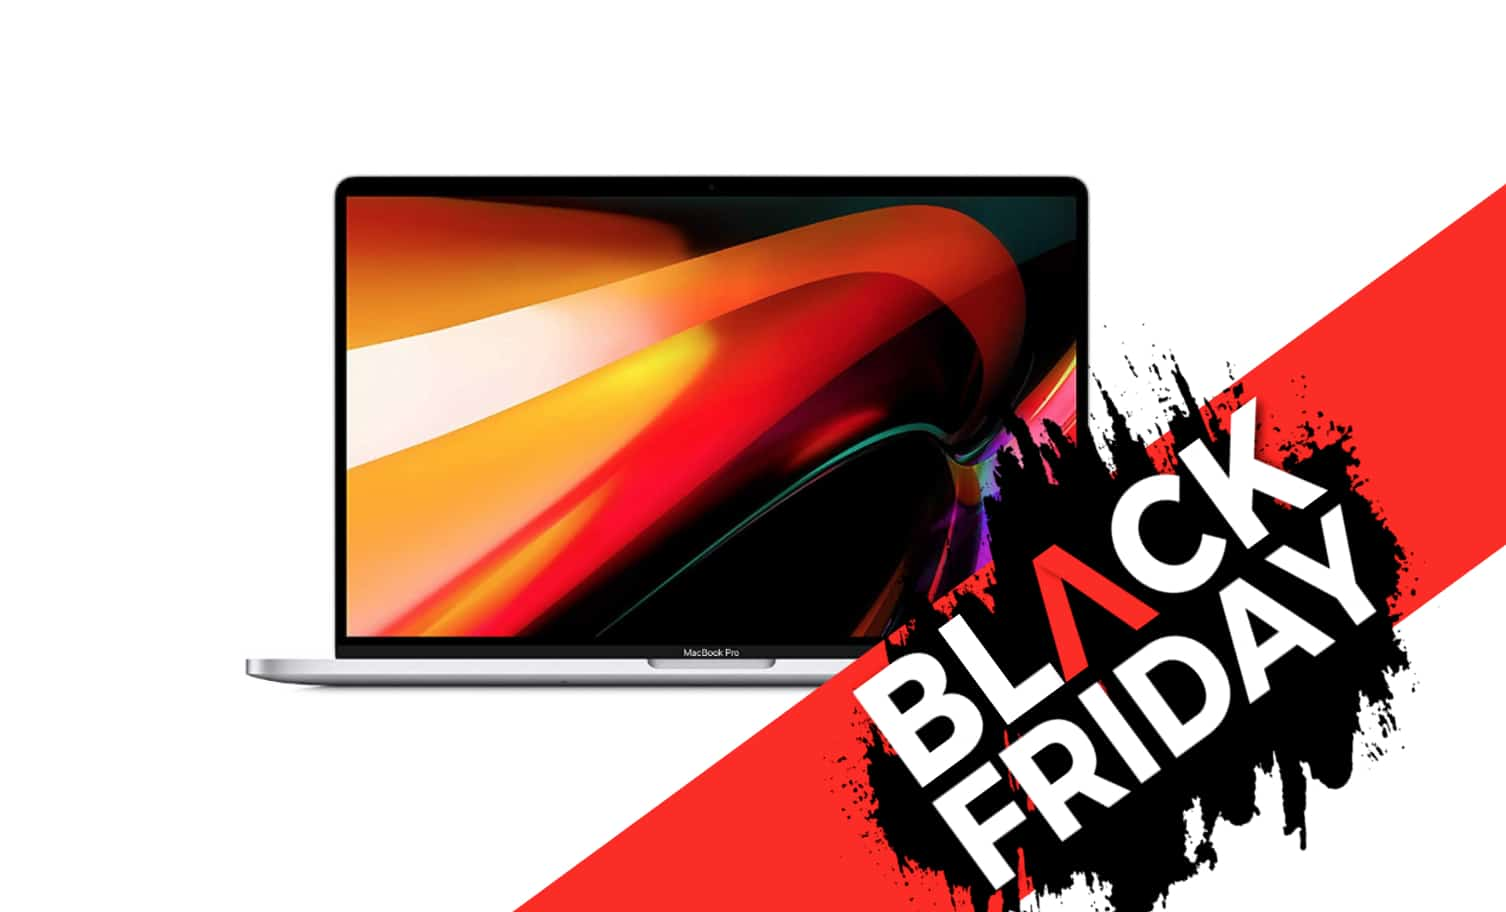 macbook pro black friday